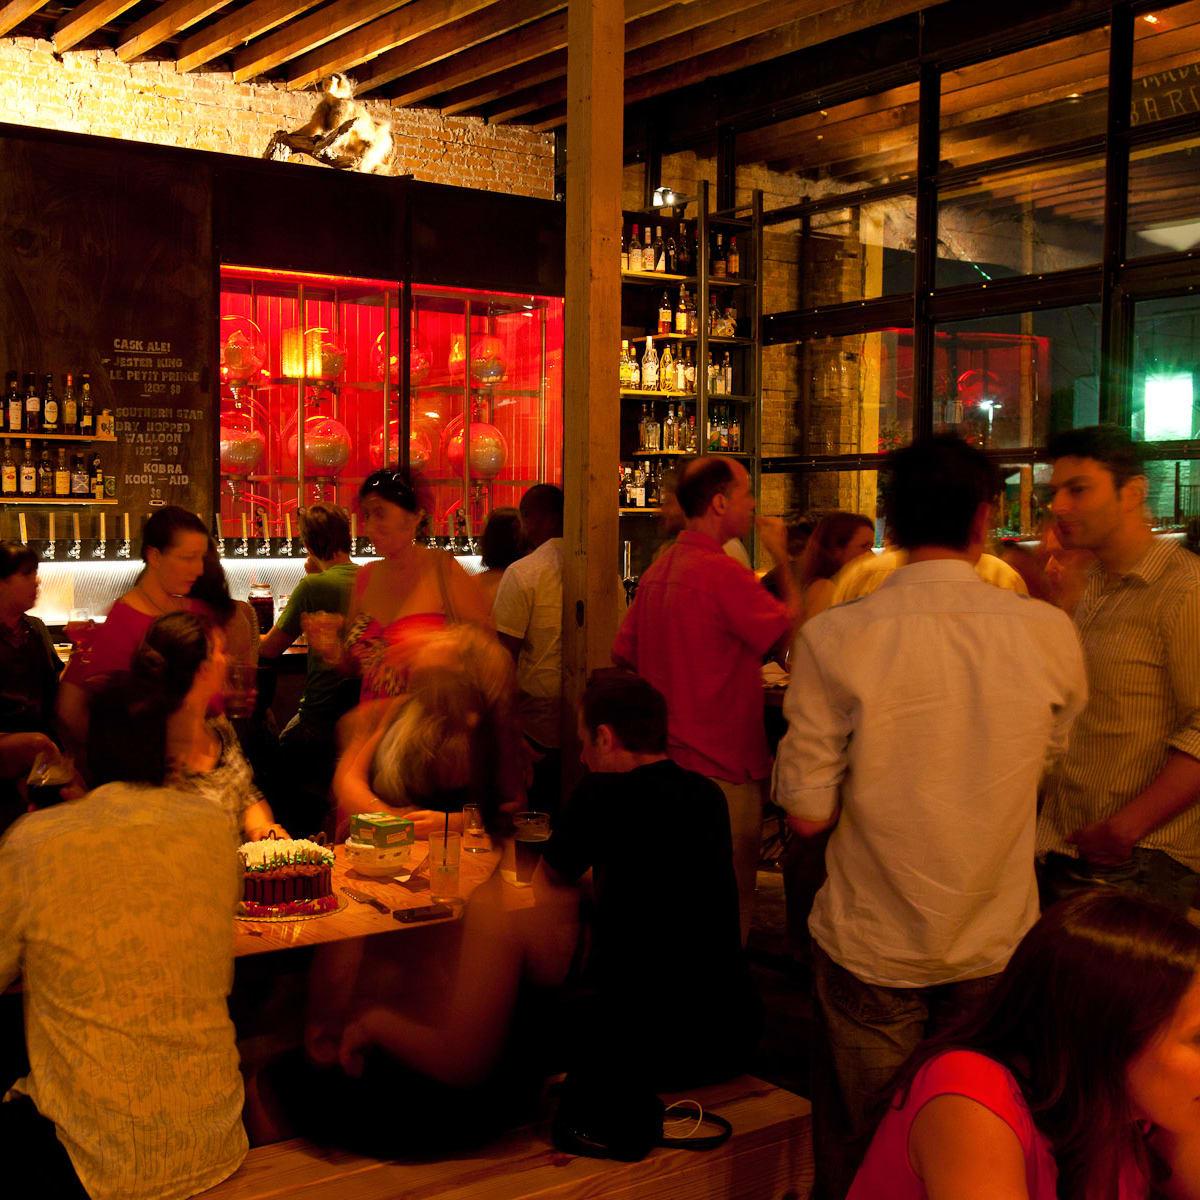 Mongoose Versus Cobra bar Houston interior with crowd